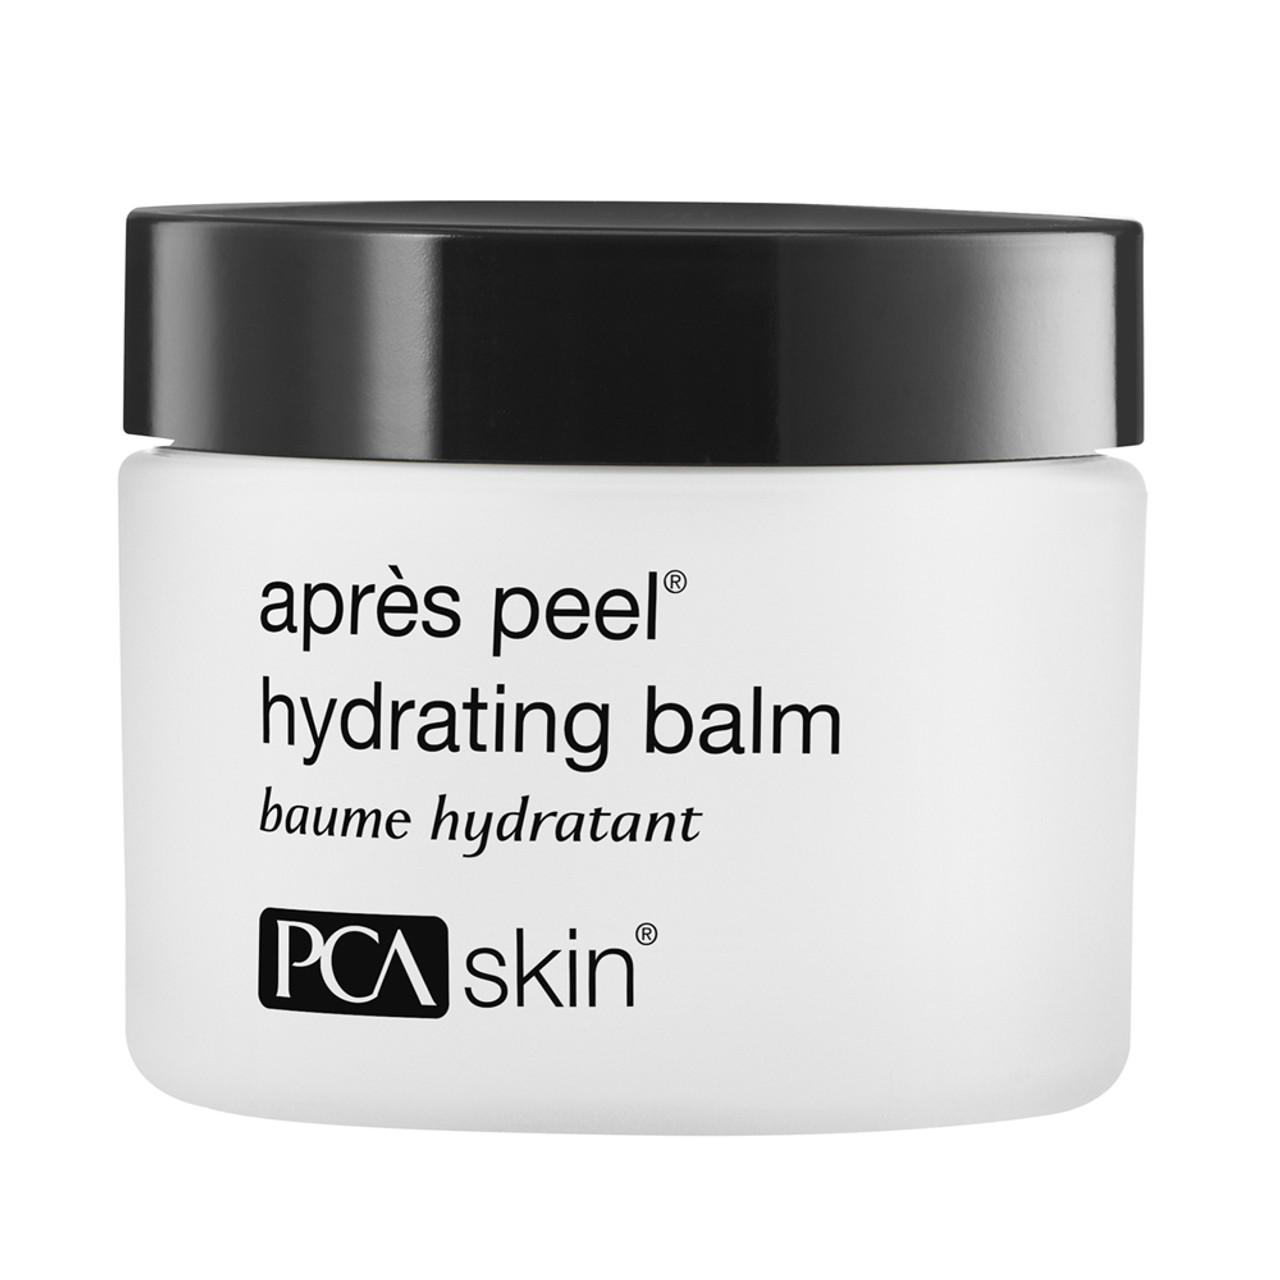 PCA Skin Apres Peel Hydrating Balm (pHaze 11+)